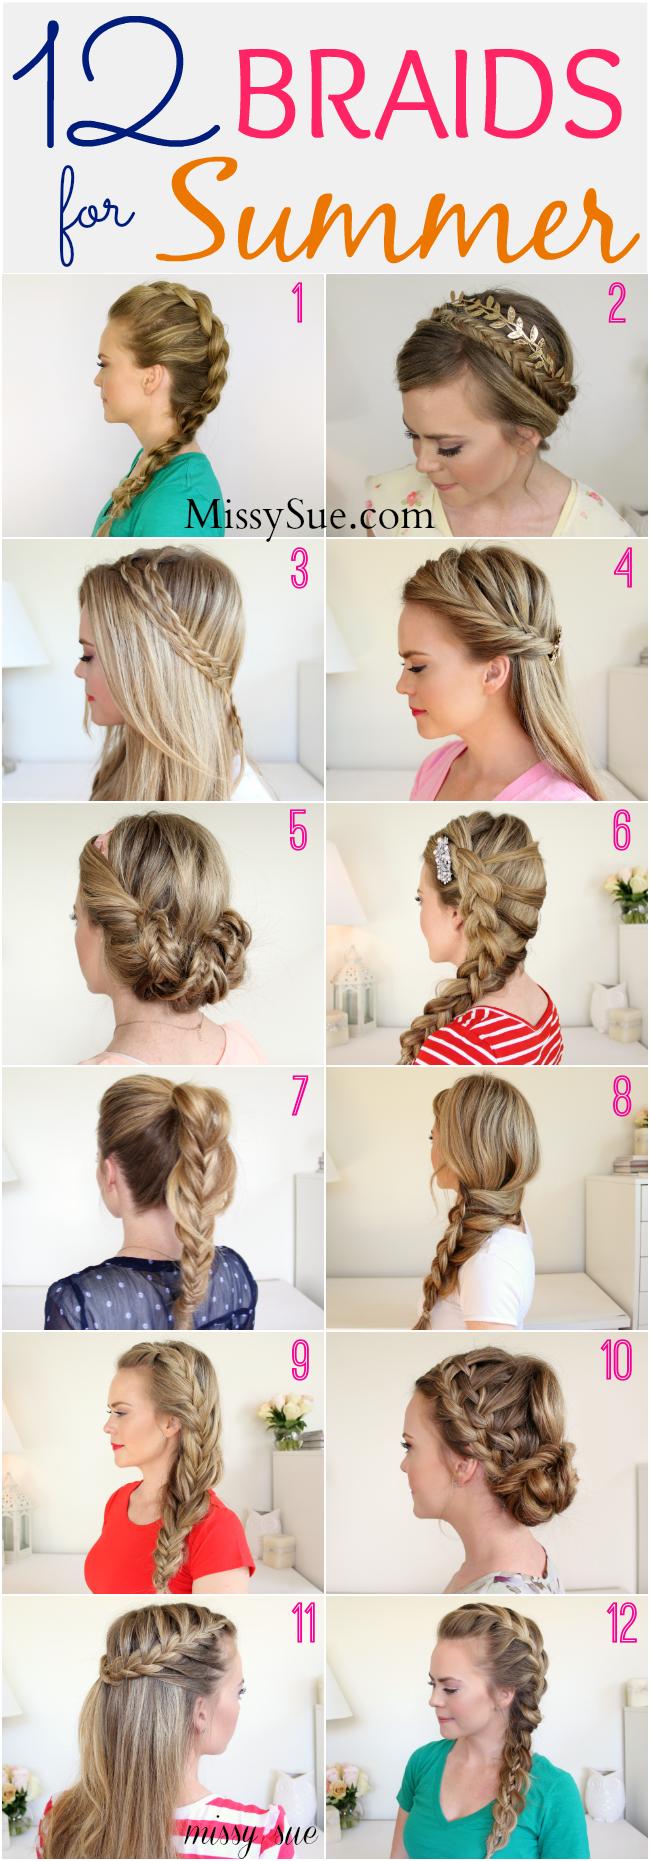 12 Braids For Summer Hair Styles Pretty Braided Hairstyles Long Hair Styles